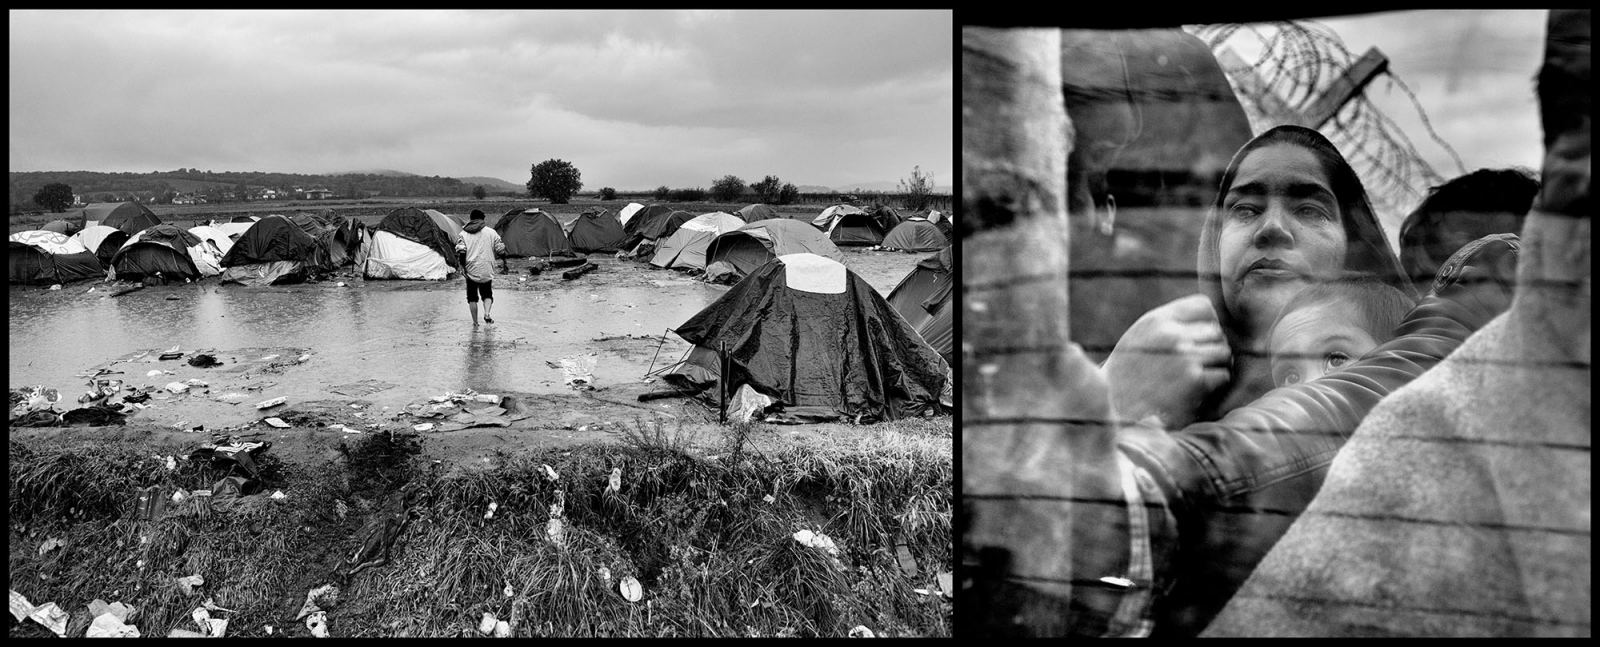 Art and Documentary Photography - Loading Nikos_Pilos_Stern_Goethe_institute_023.jpg